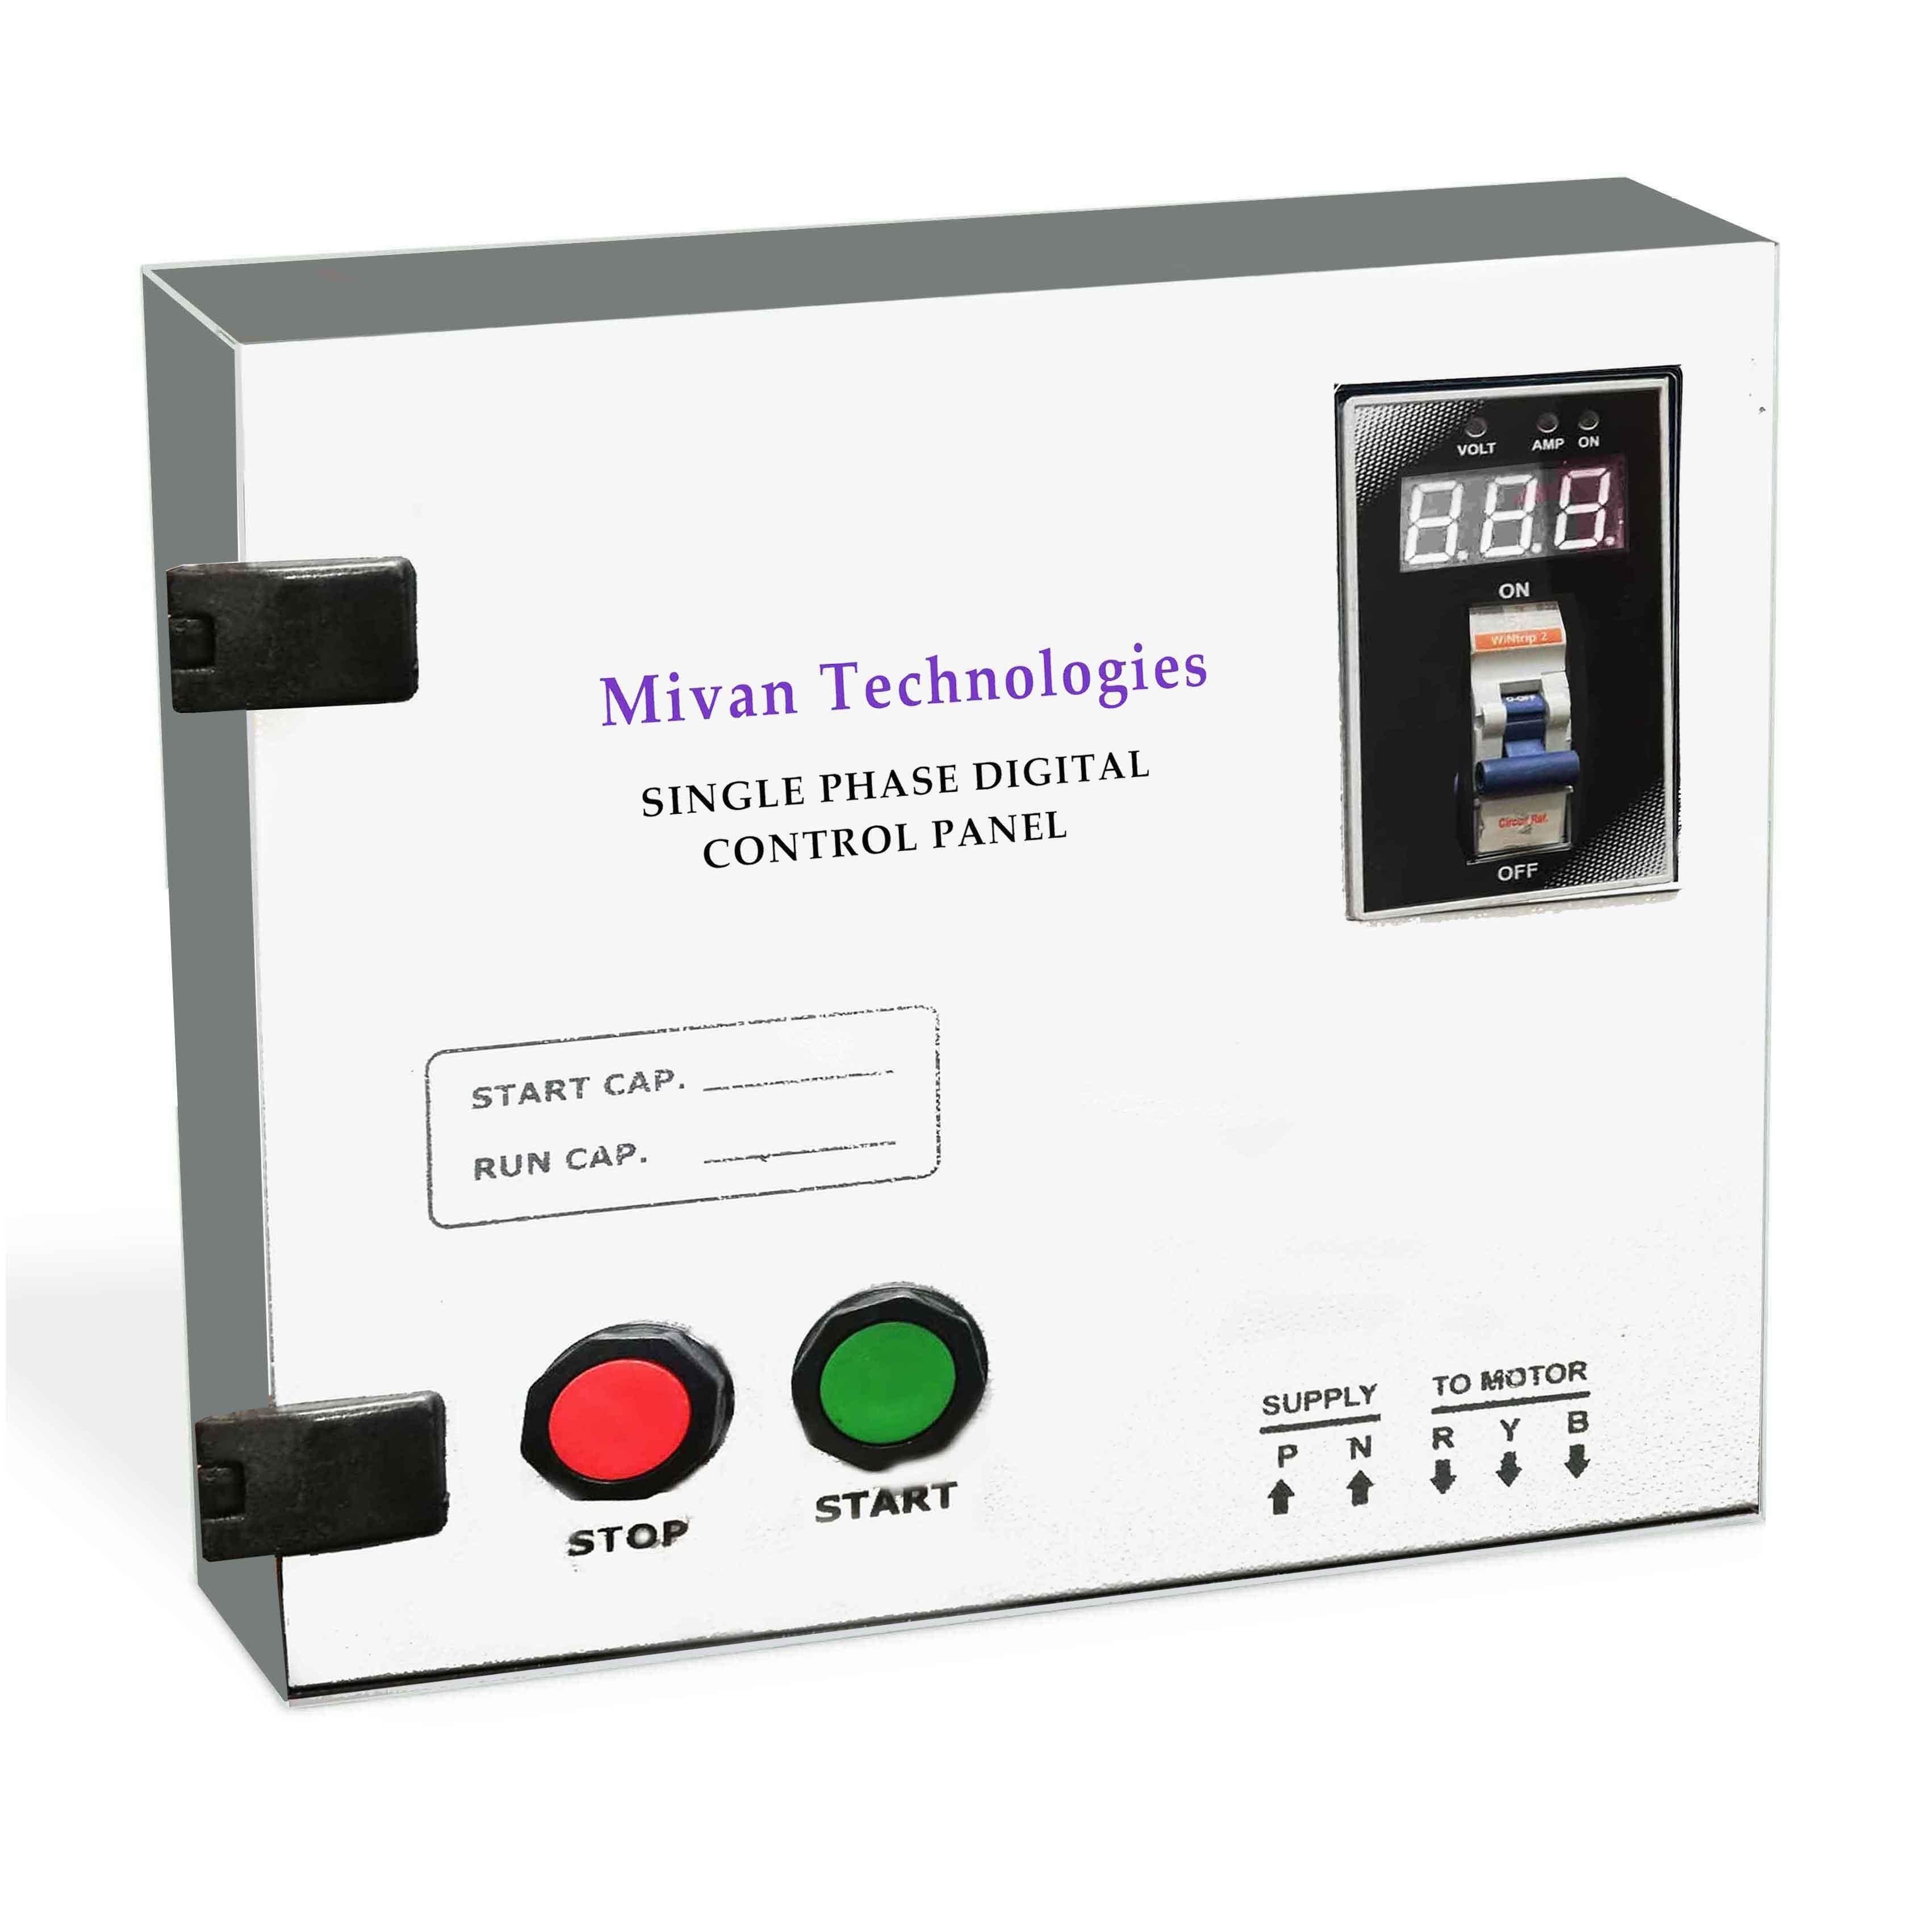 https://mivan.co.in/assets/img/product/15737323050_288_1313.jpg